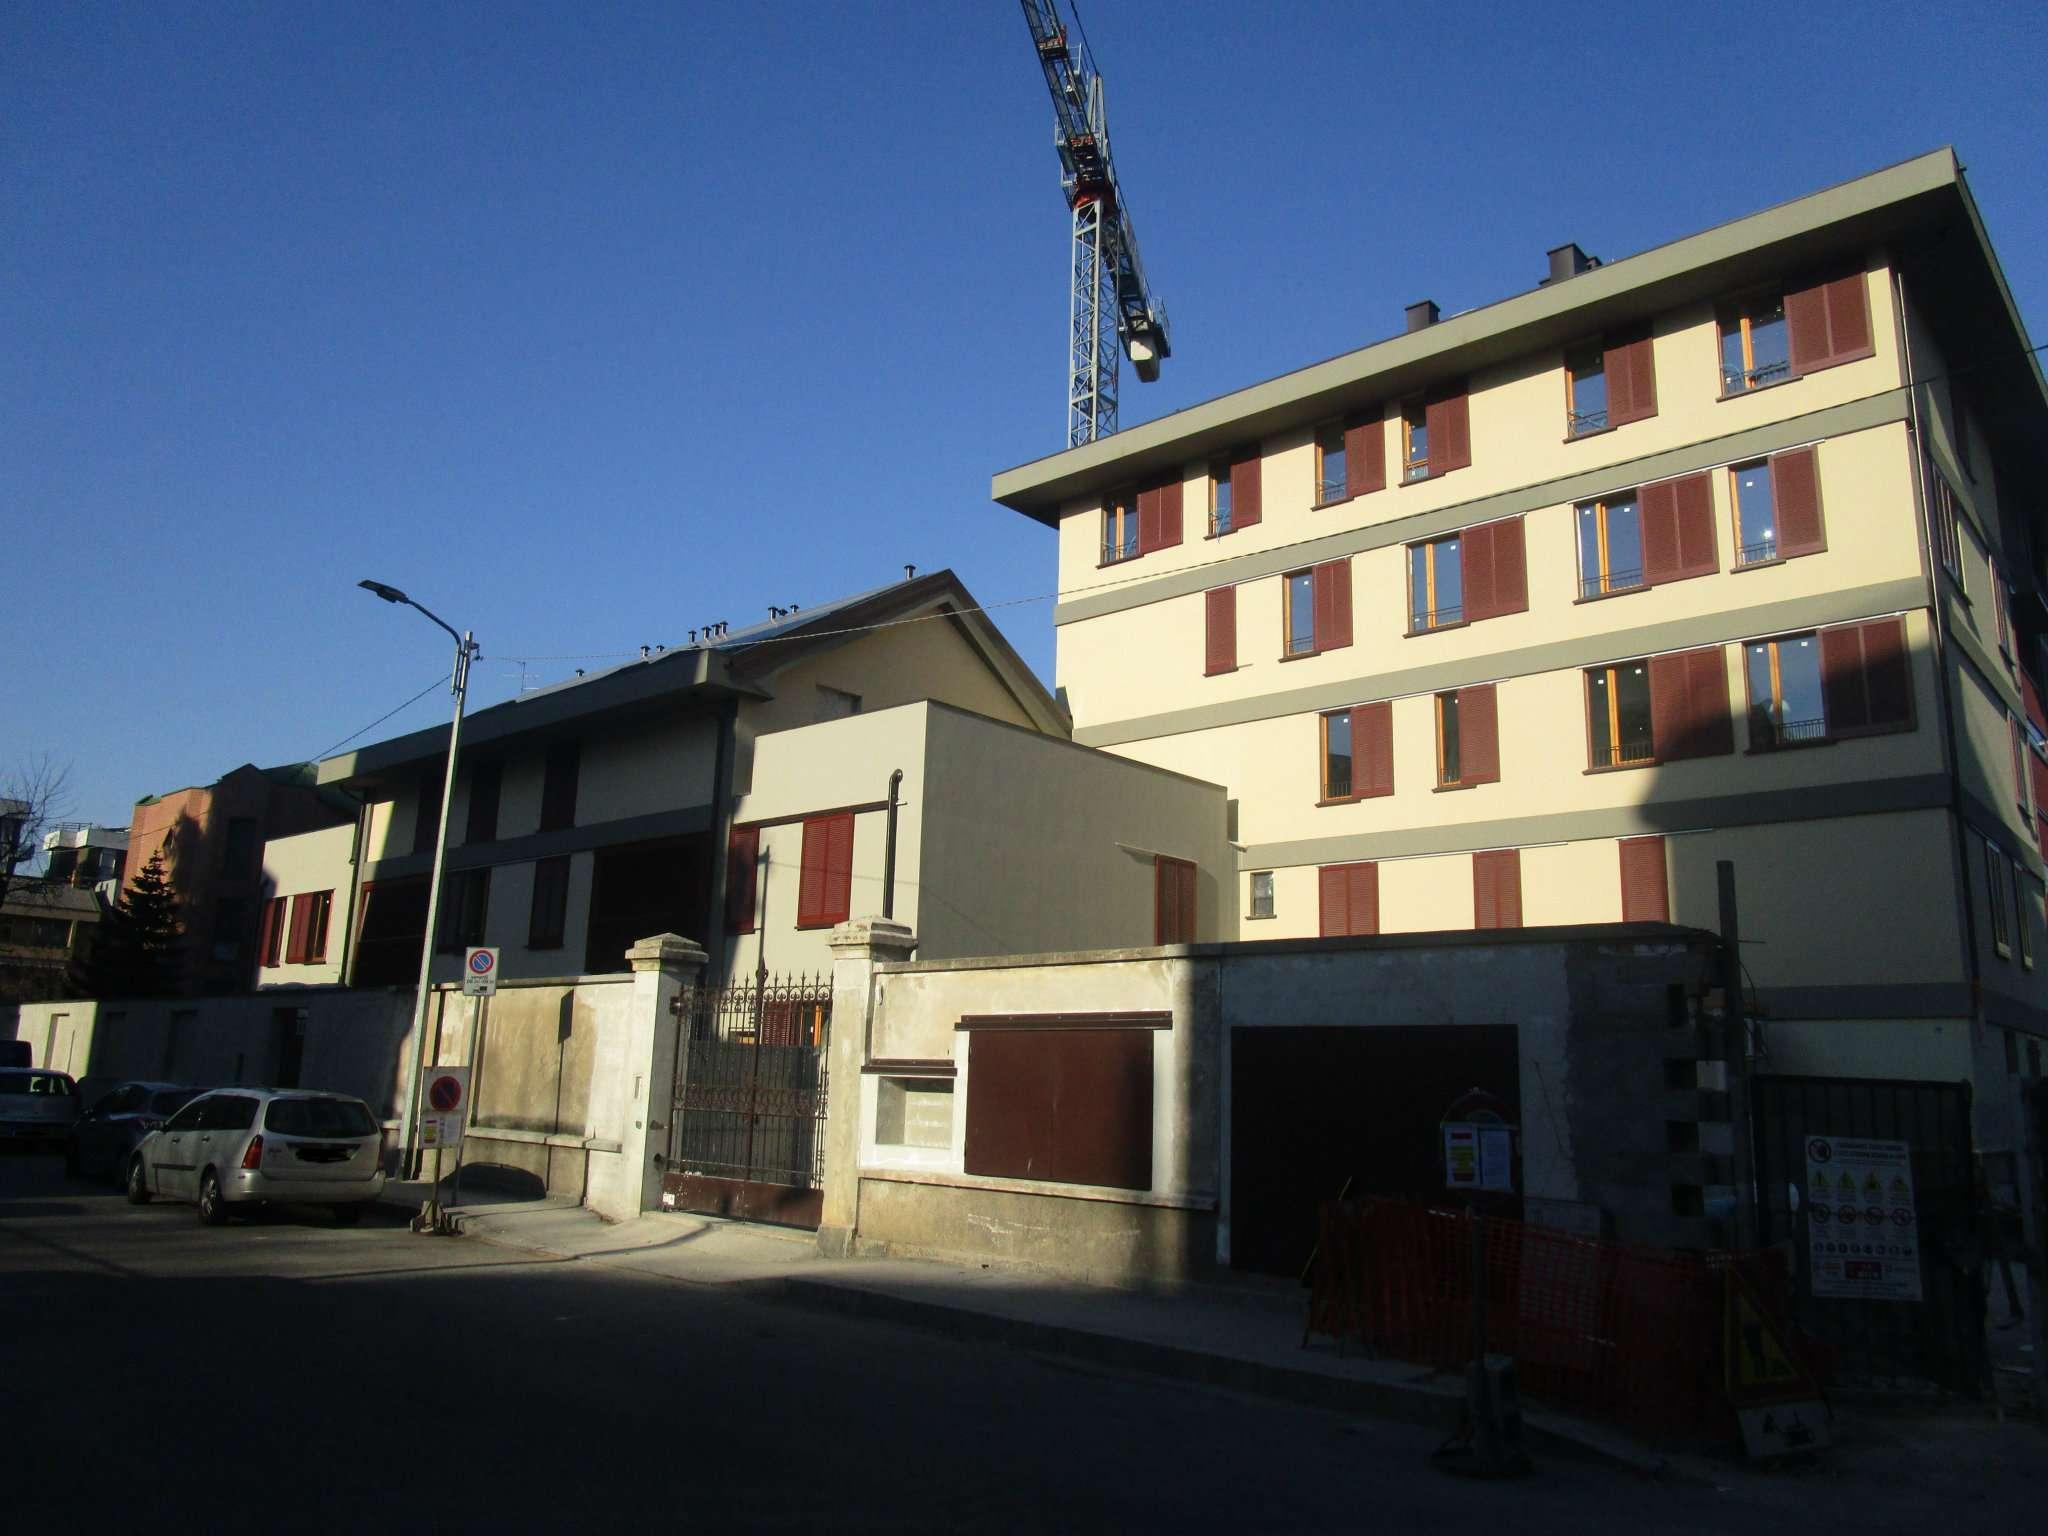 Bilocale Monza Via Oslavia 4